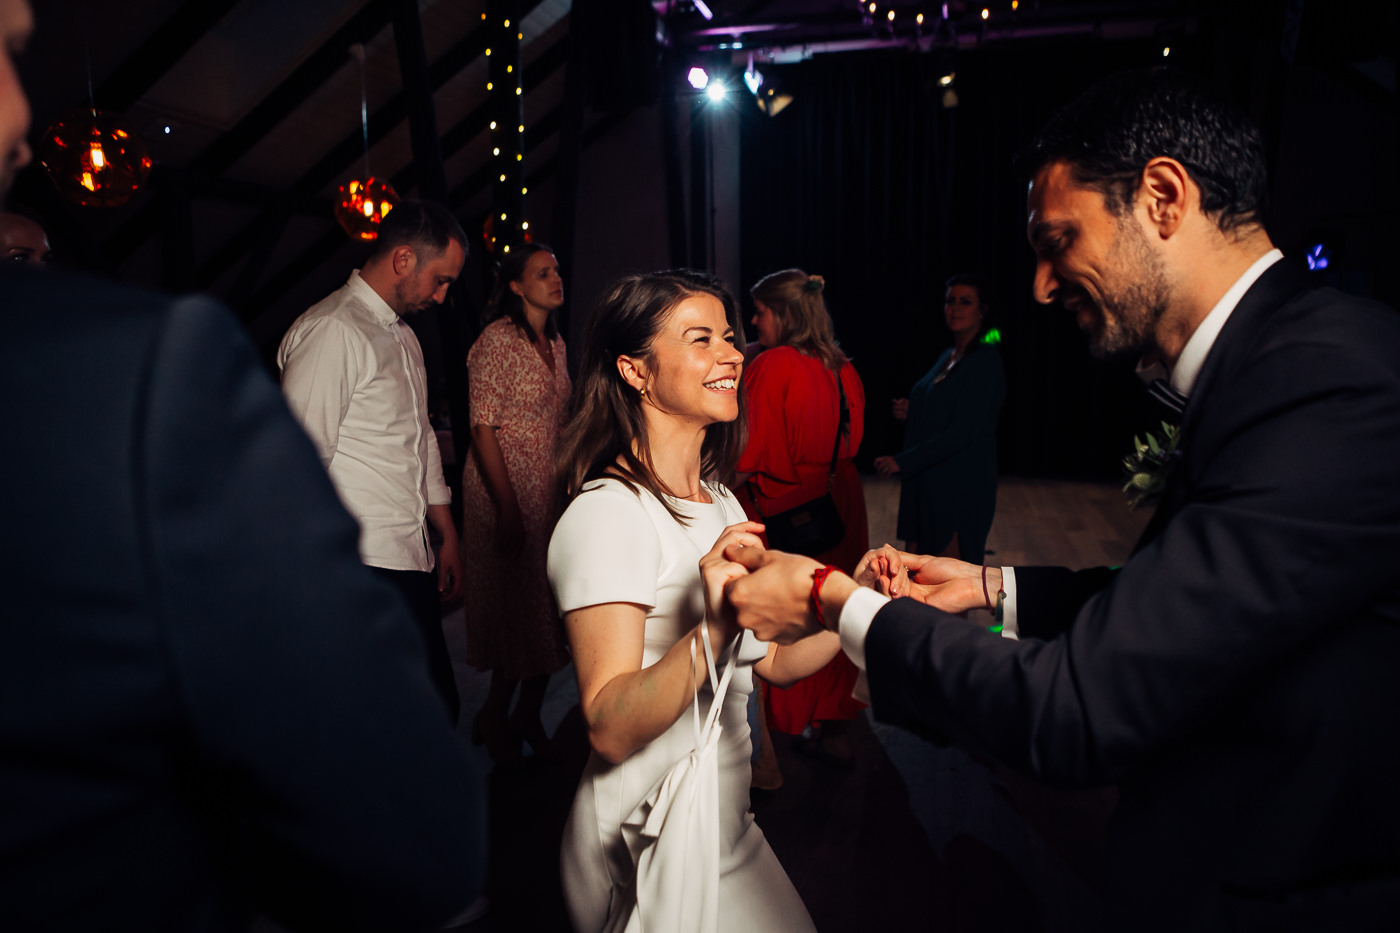 Malene & Ole Martin - elegant dansk- norskt bryllup i Oslo Bryllup Gamle Aker Oslo 1 Akershus